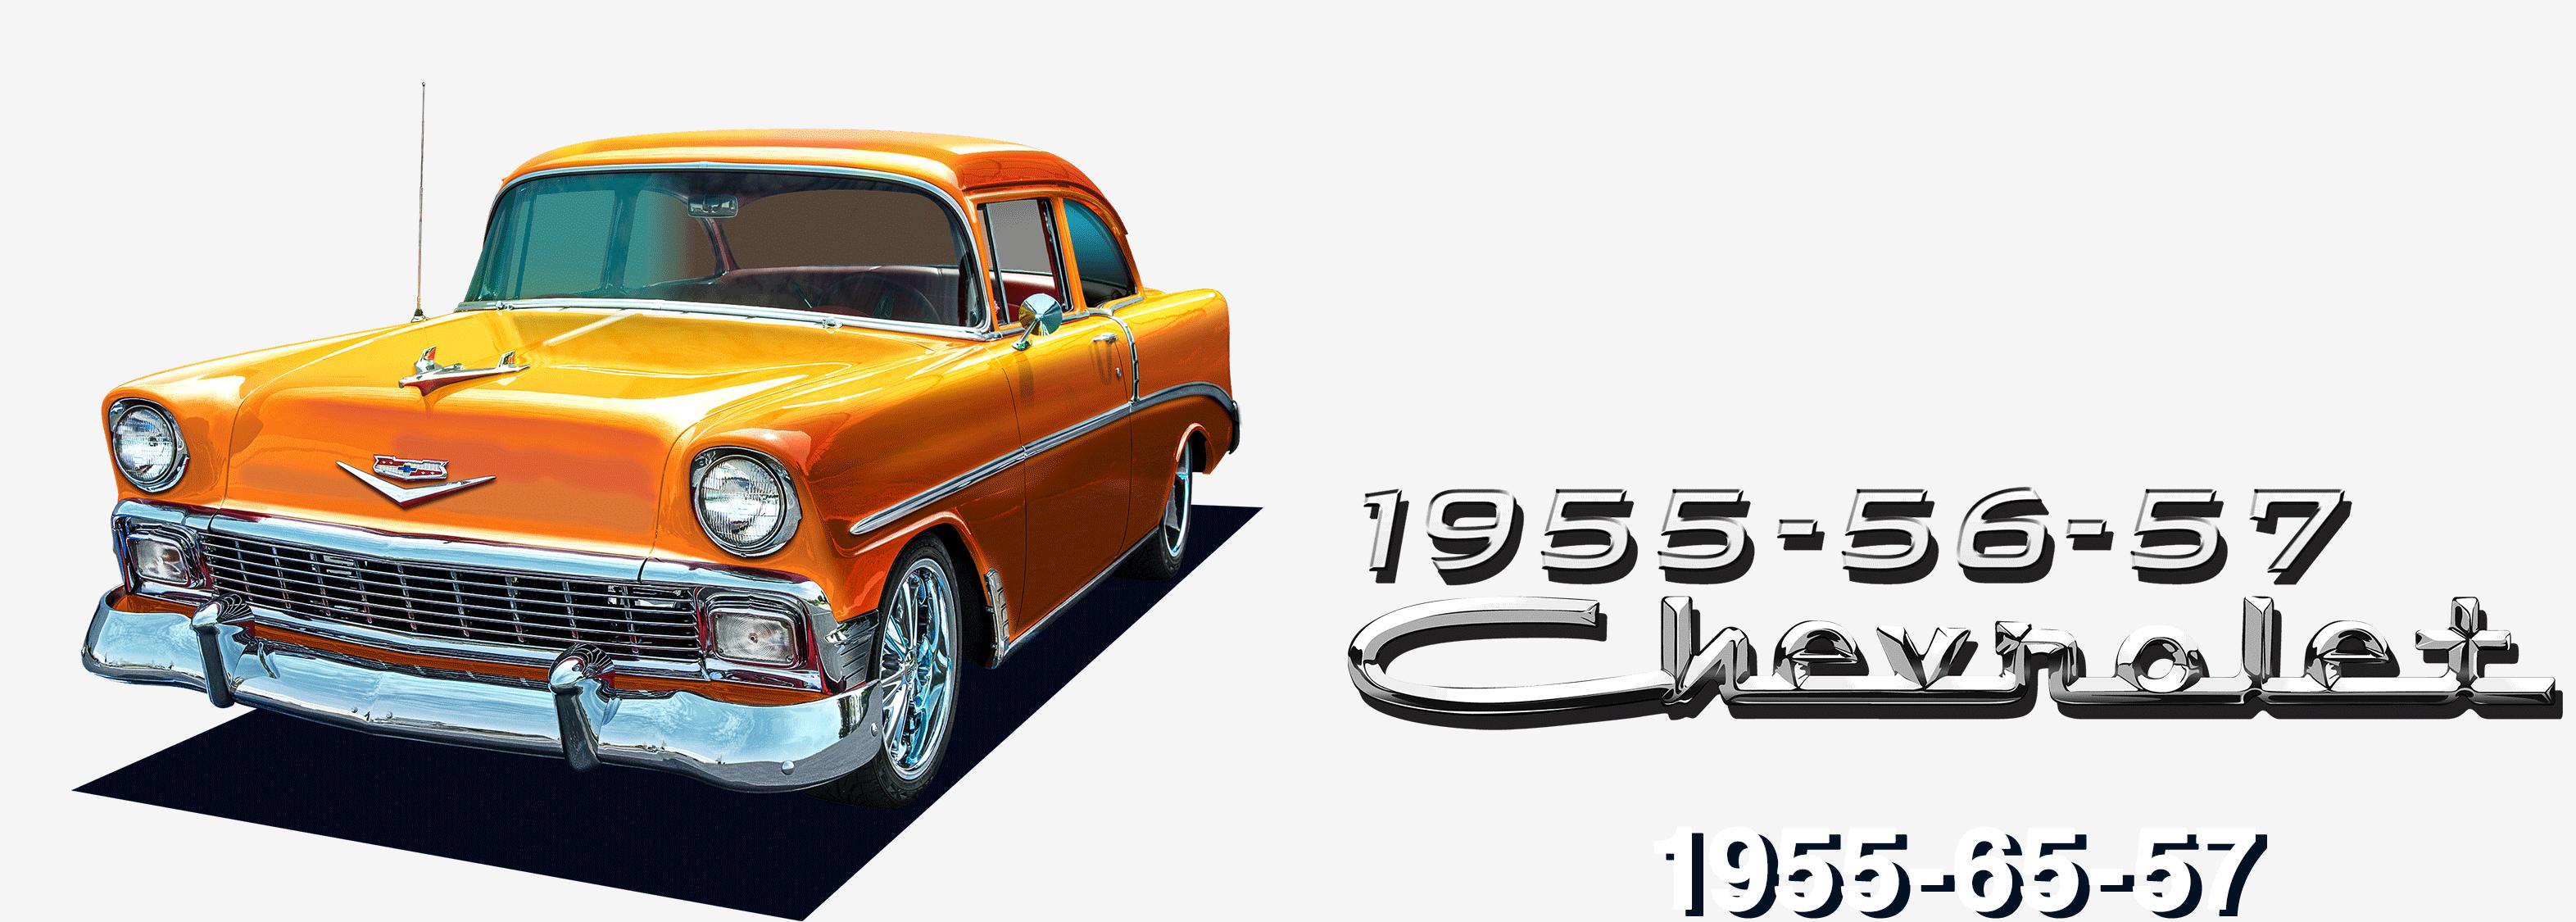 Tri-five 1955-56-57